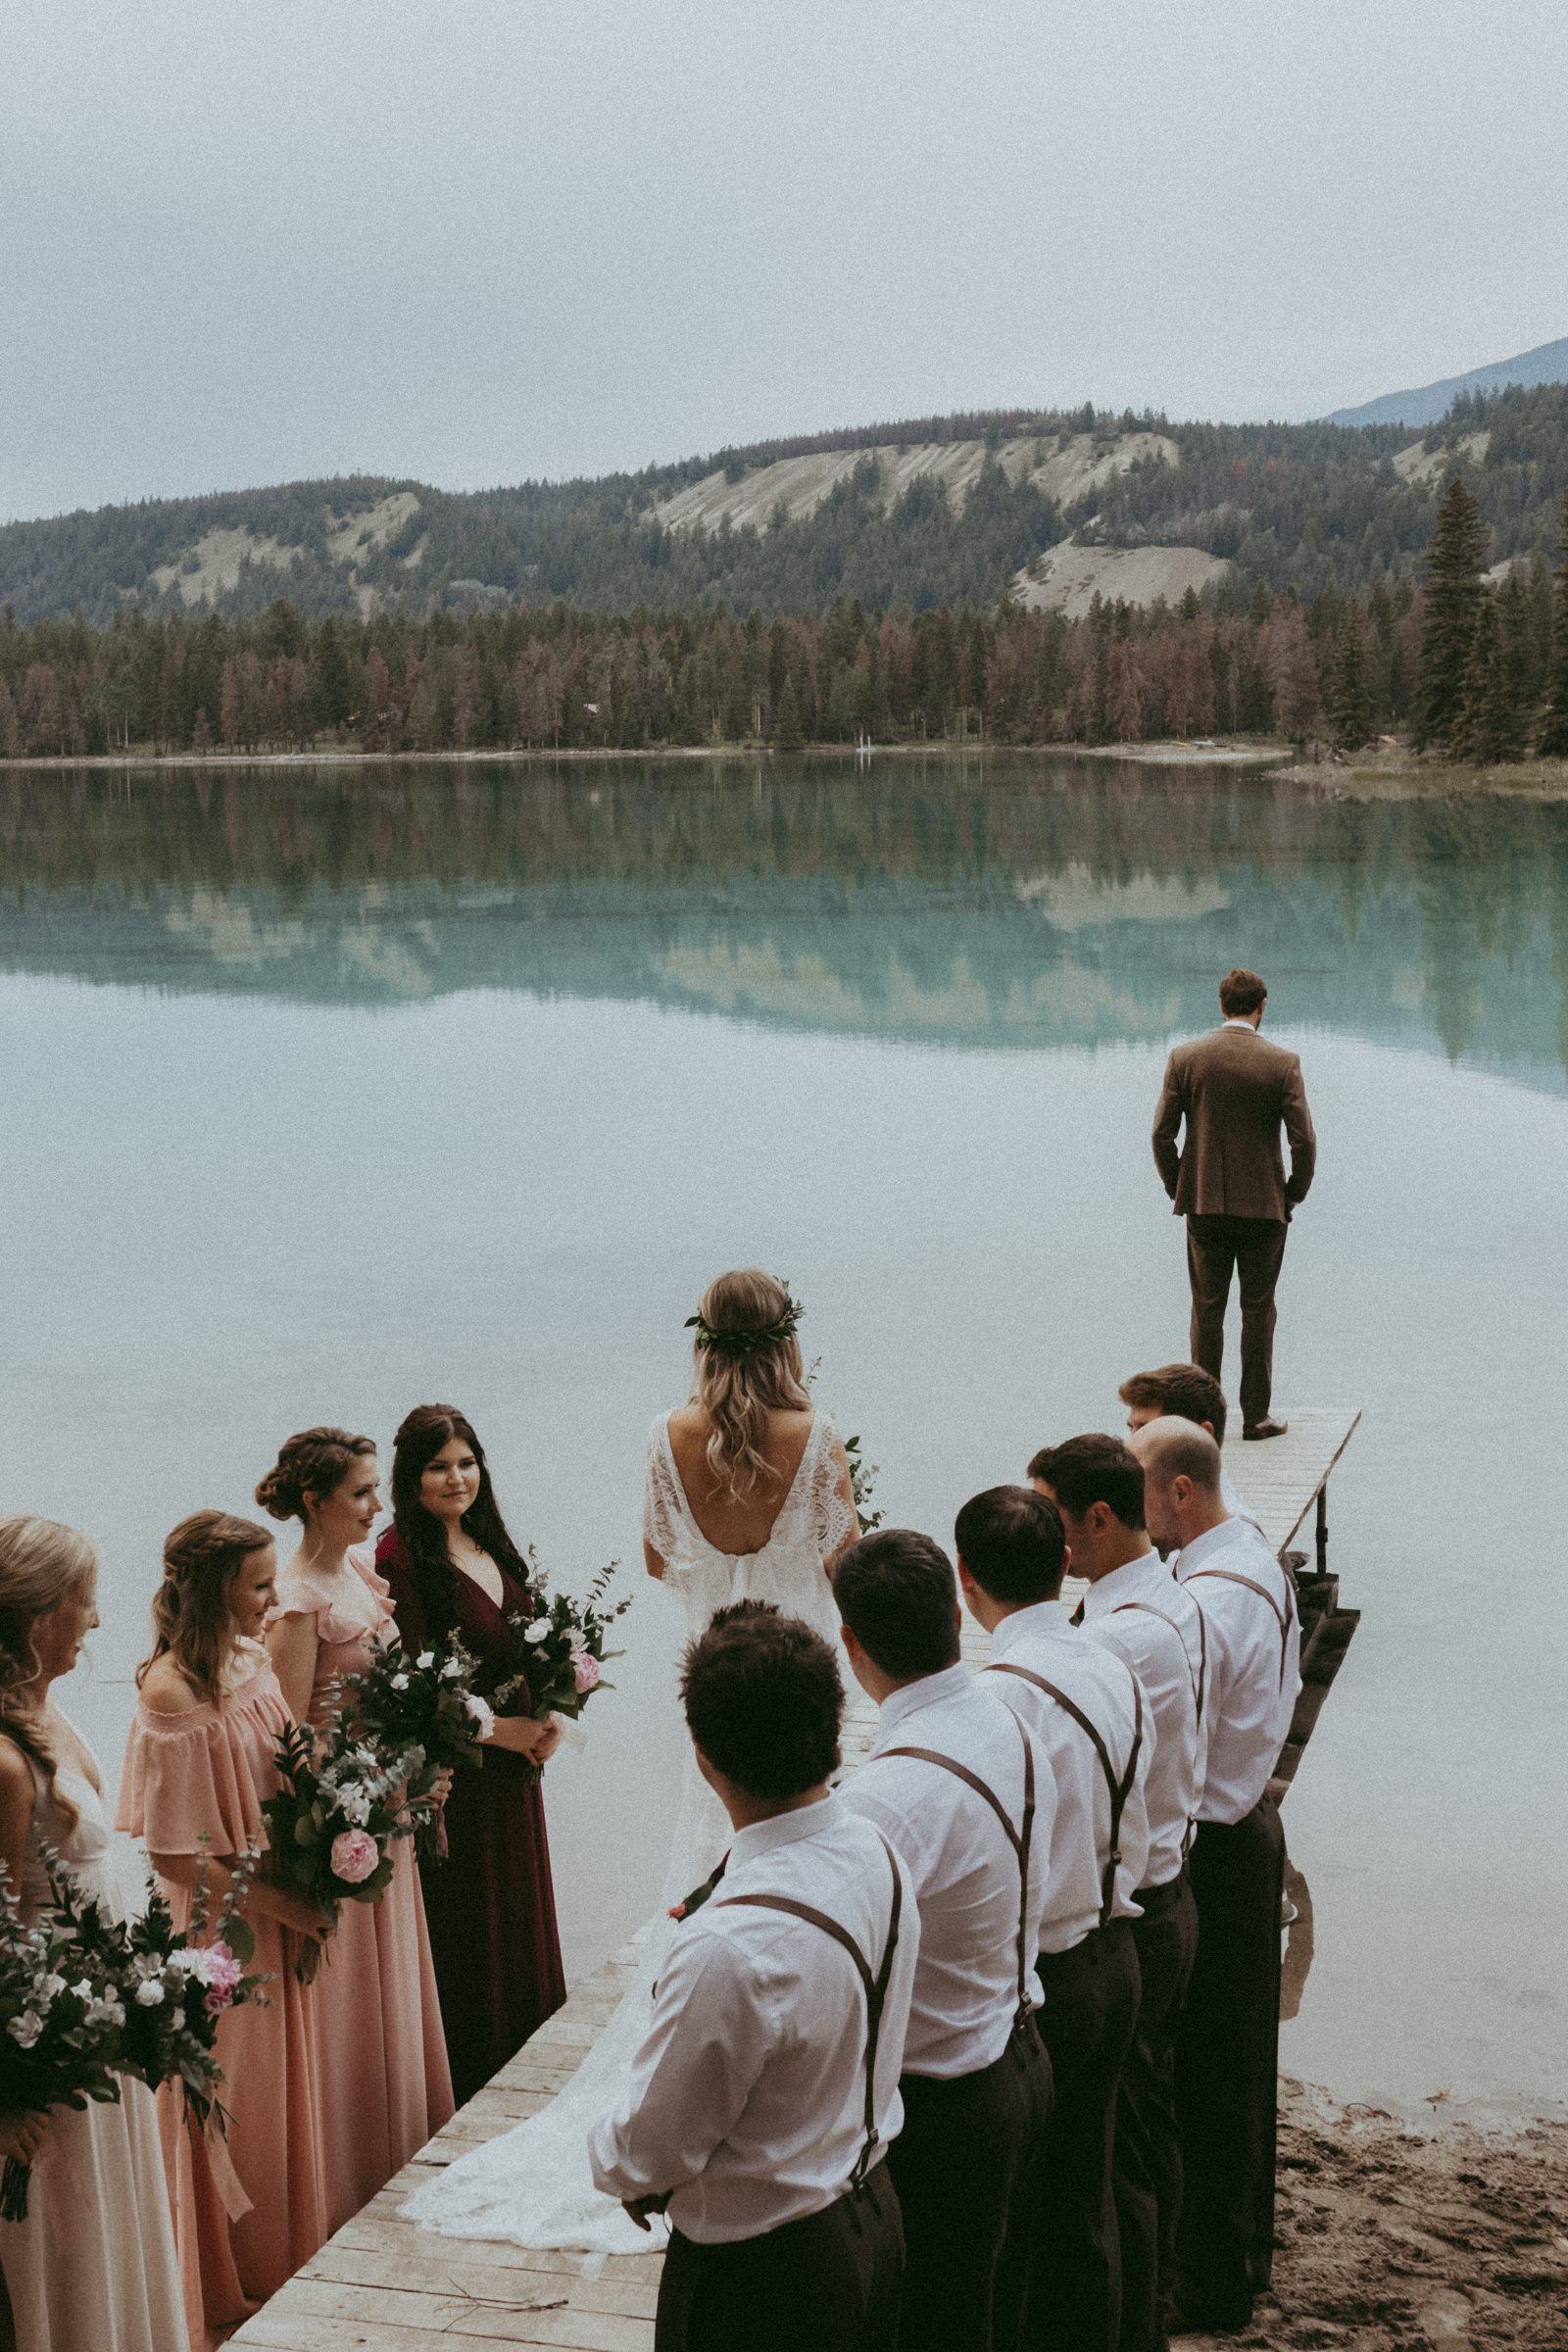 19-06-22 - Rebecca & Aaron - Jasper Wedding - Rocky Mountain Wedding-9.jpg